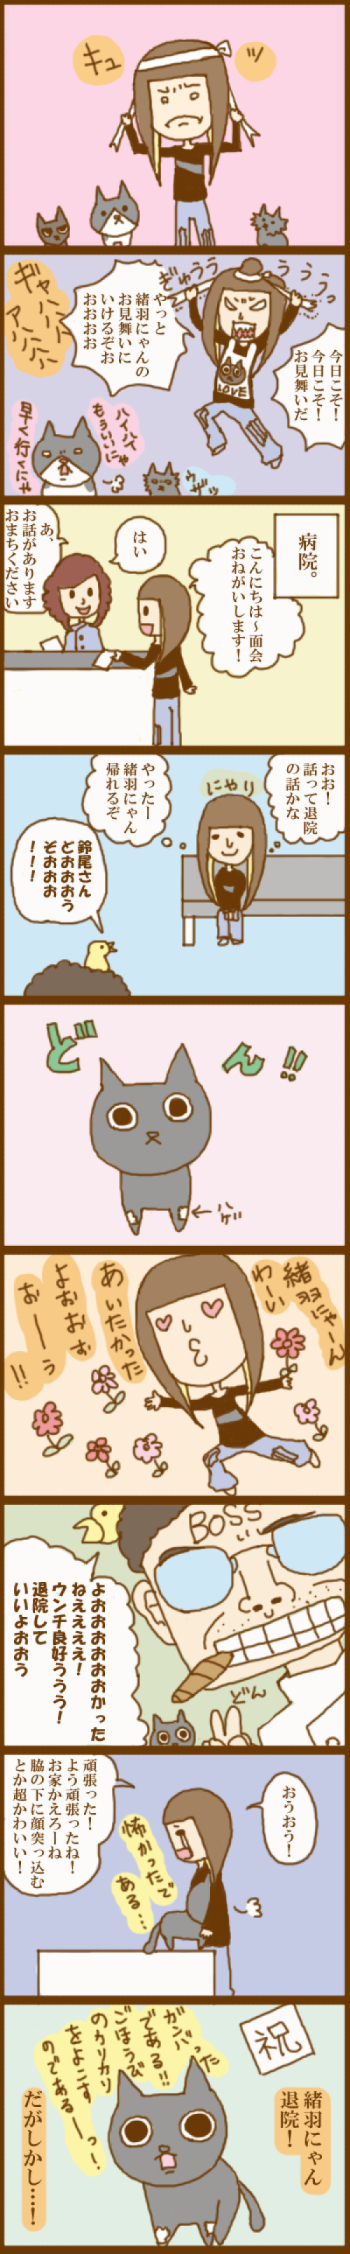 f:id:suzuokayu:20201112092512j:plain